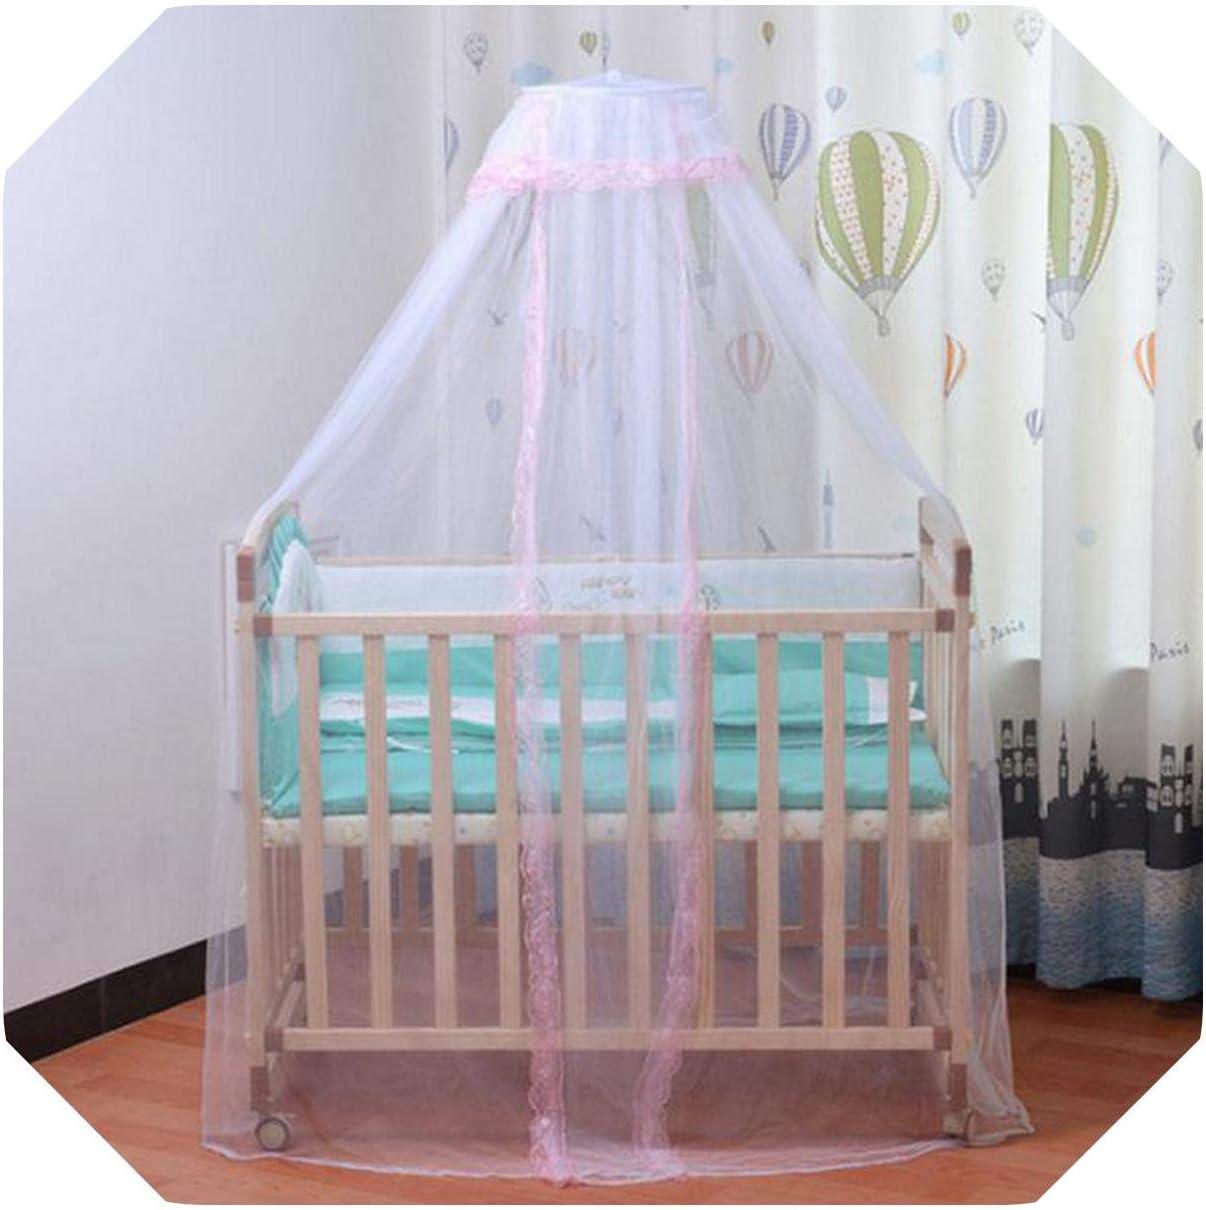 Eileen Ford Canopy para niñas   Mosquitera Plegable Royal Court Princess Cute Mosquito Bed Canopy Cover con Encaje para bebé Ty-PL-